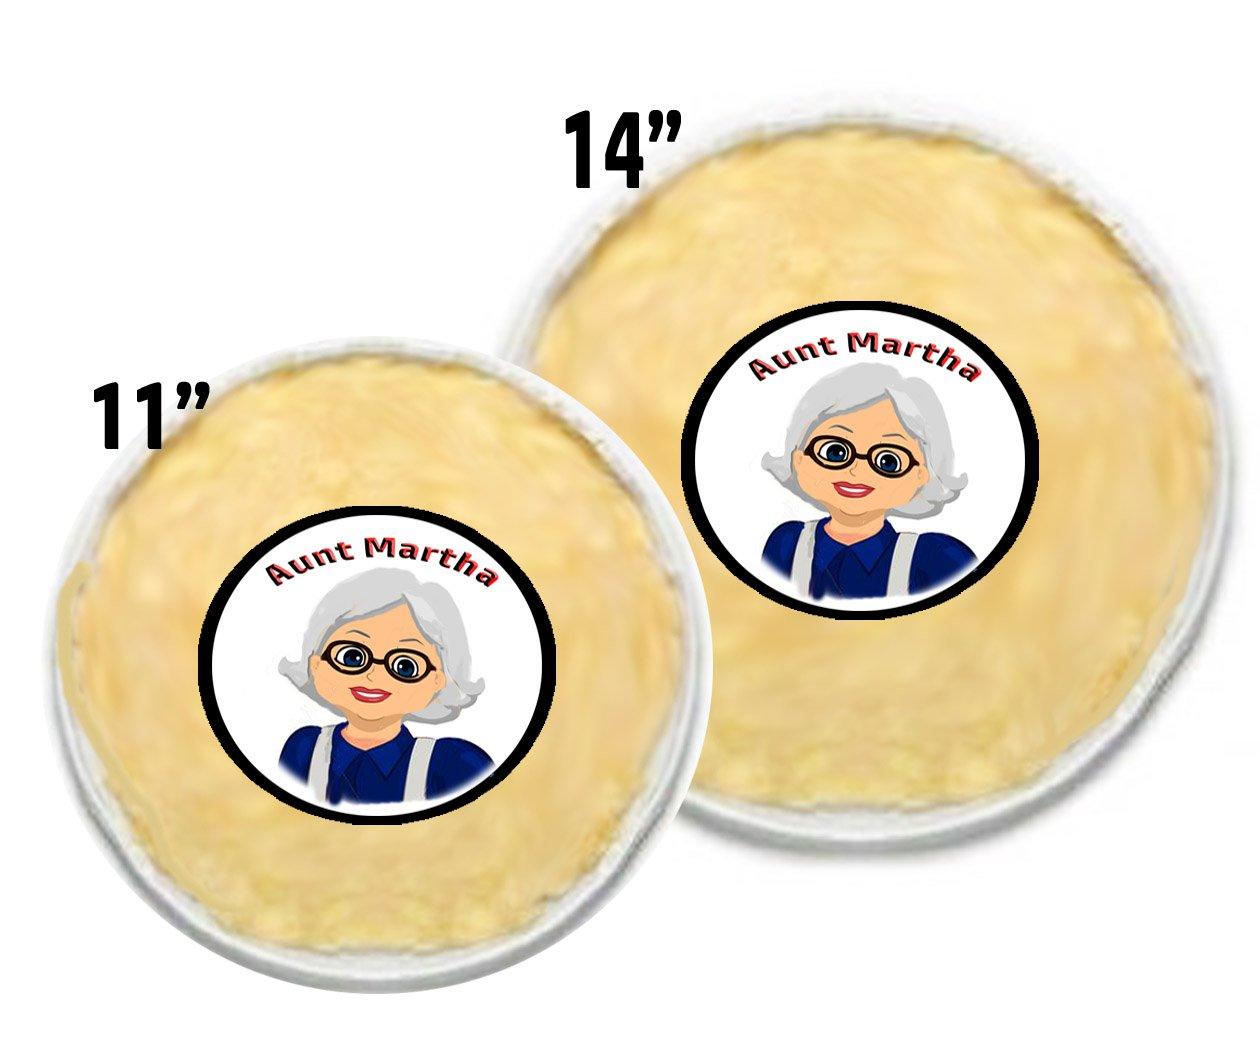 2 Aunt Martha's Pie Crust Maker Bags; One Bag 14'', One Bag 11''